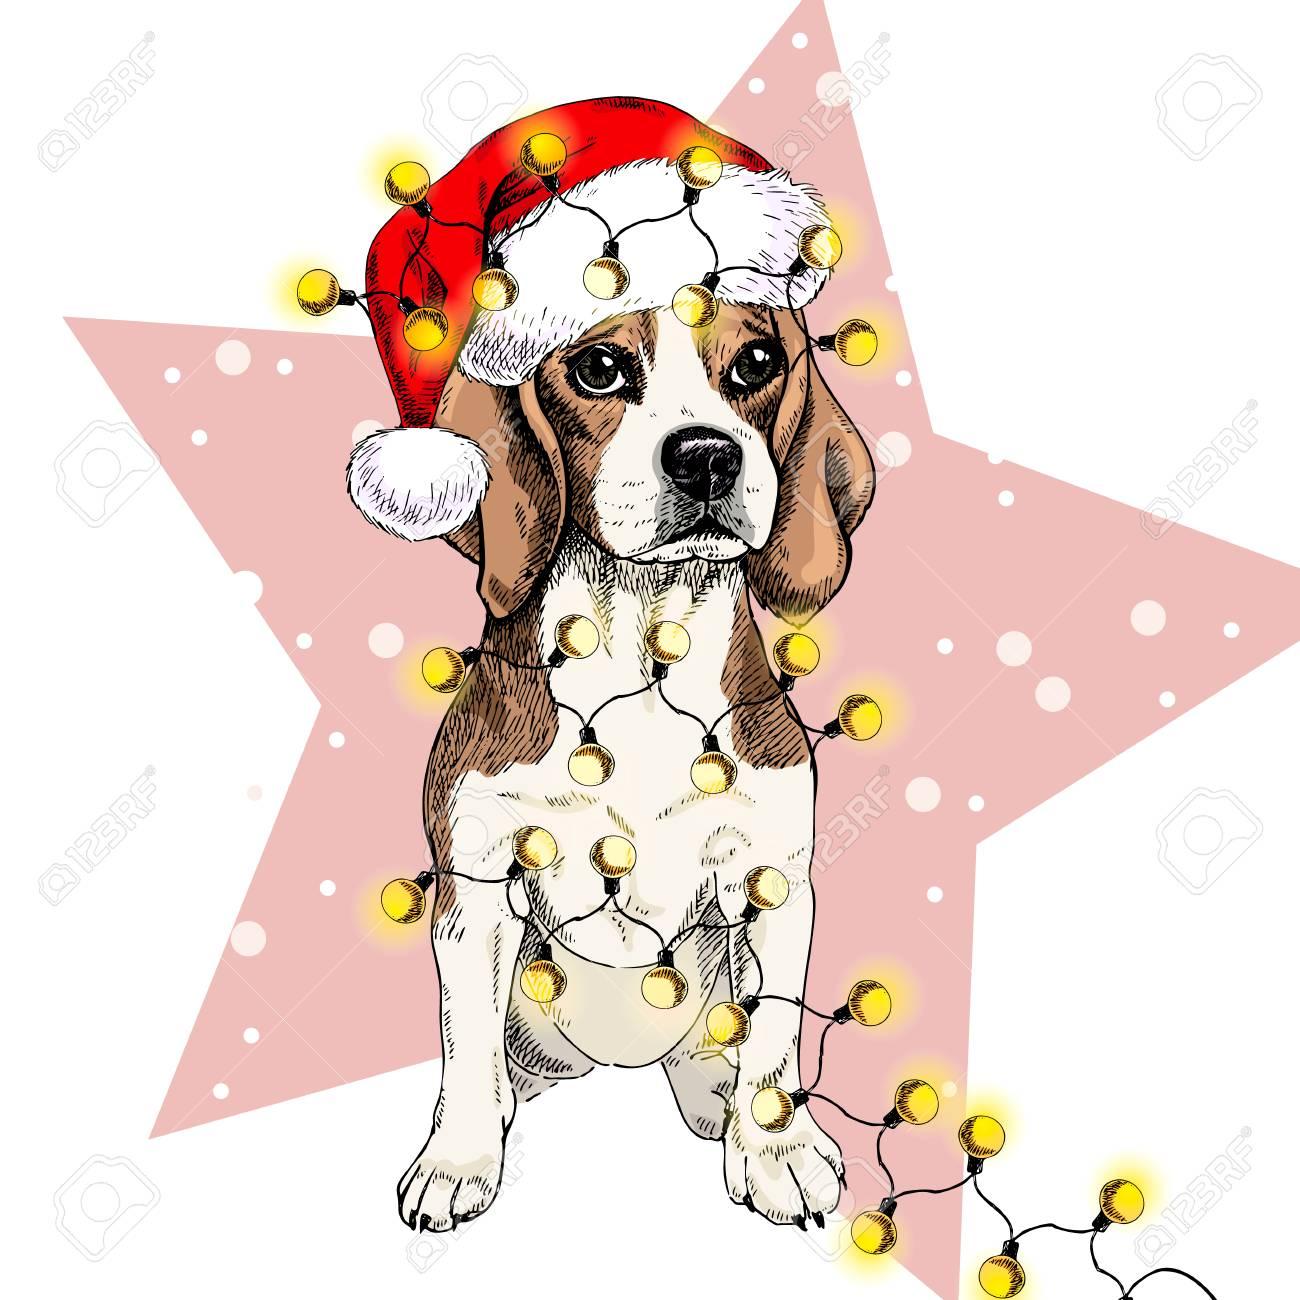 Christmas Beagle Clipart.Vector Portrait Of Beagle Dog Wearing Santa Hat Christmas Lights